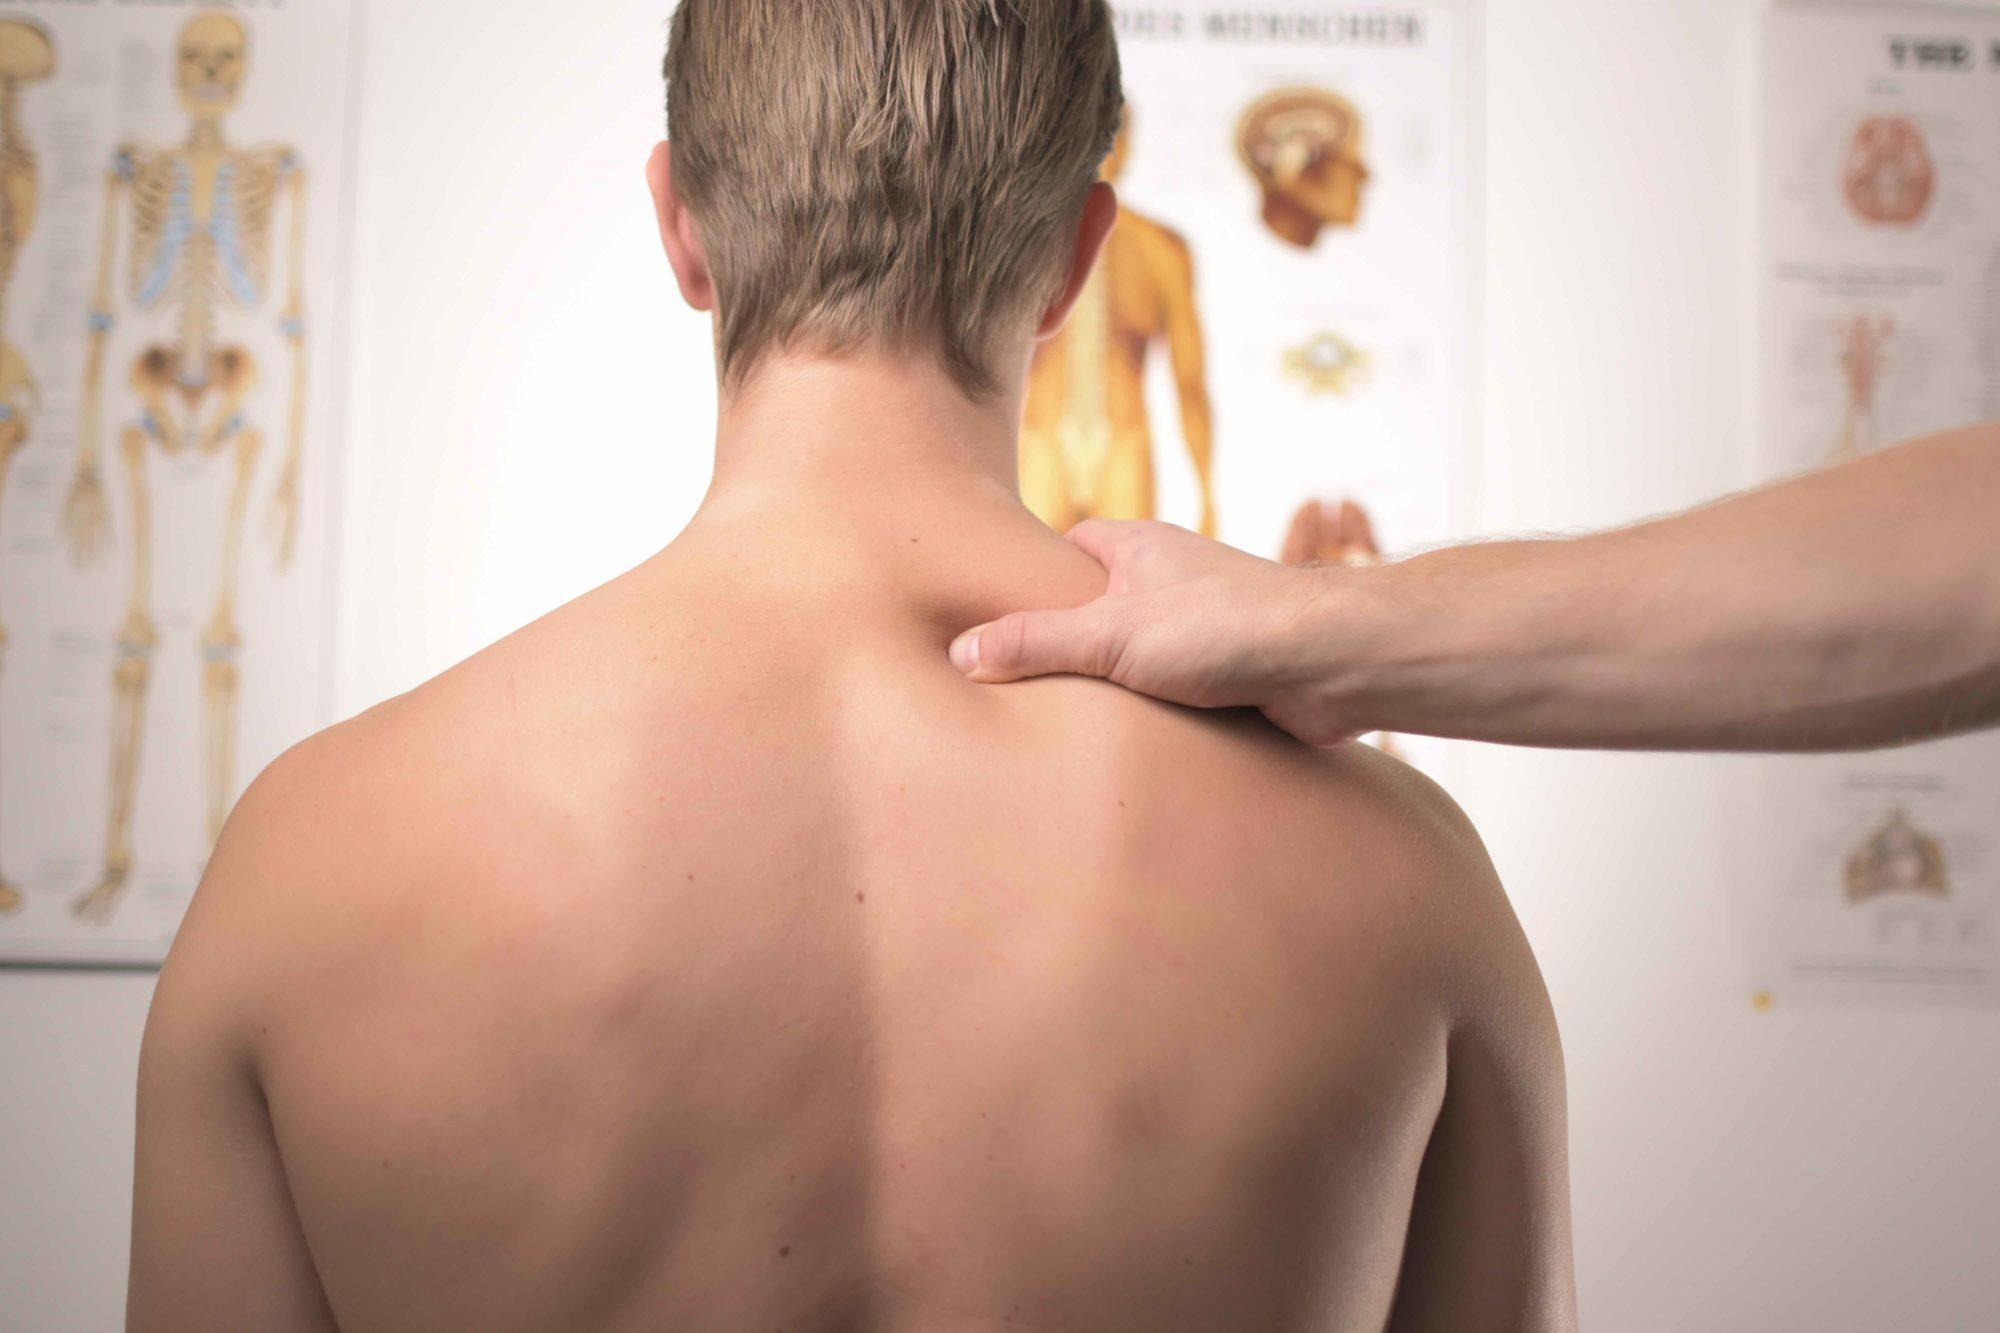 CBD Oil for Pain Management: Studies Says It Works